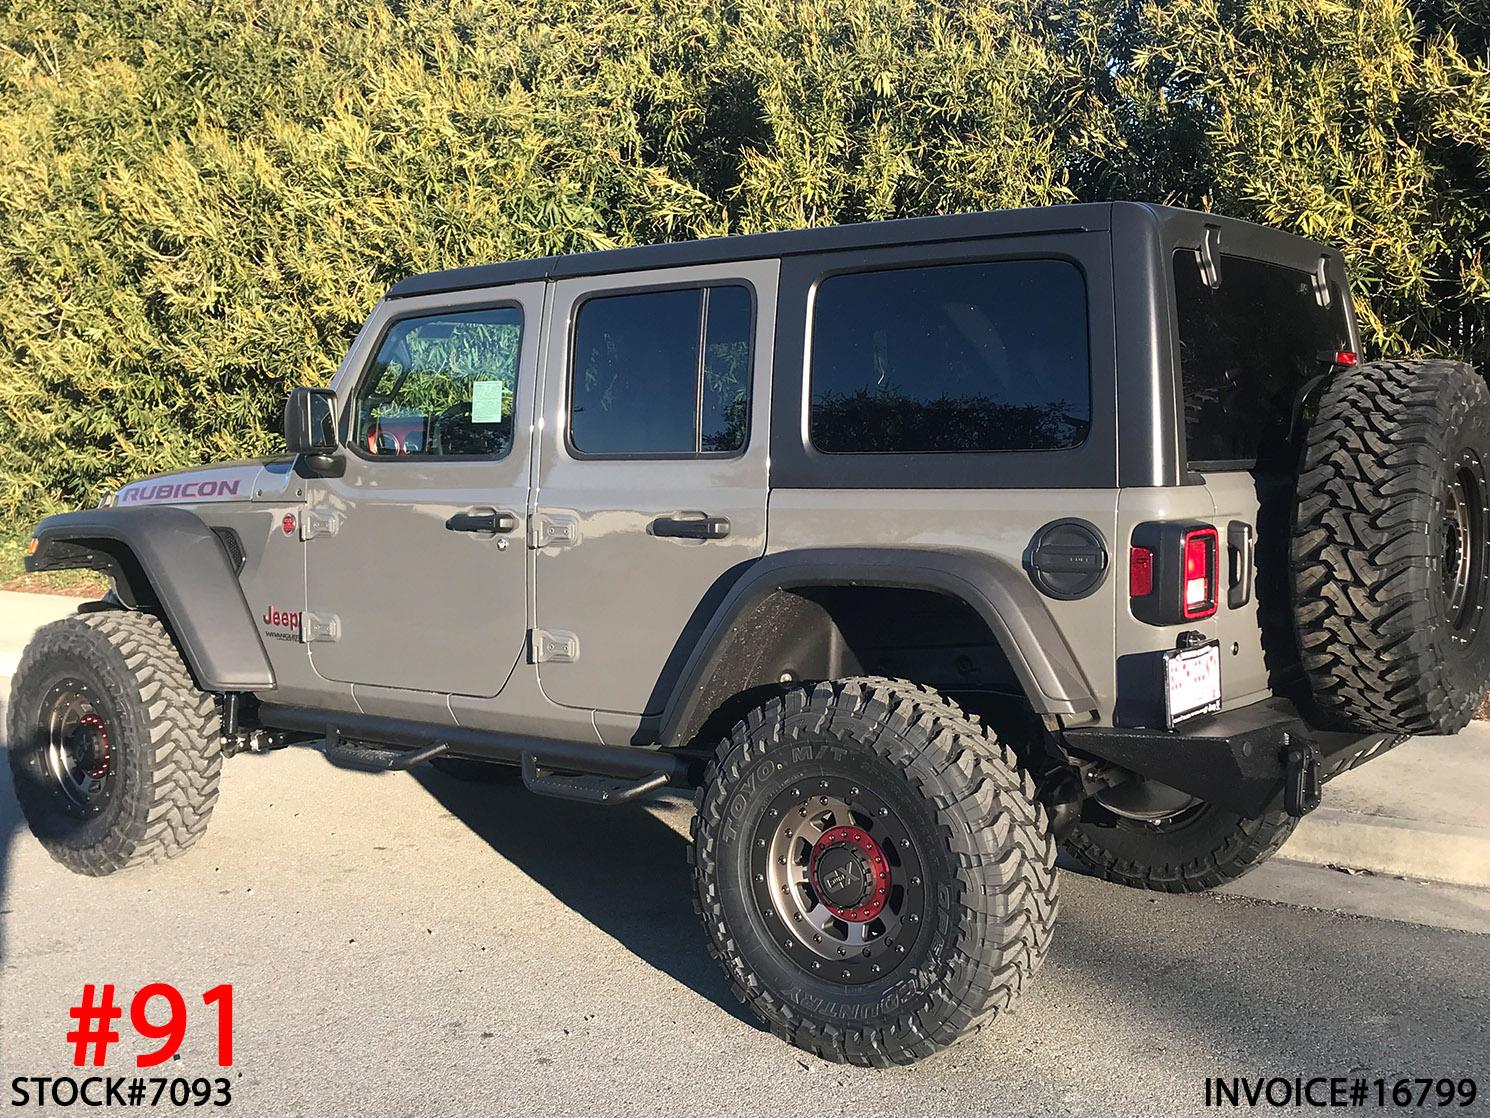 7093 SCC 2019 Jeep Wrangler JL Rubicon